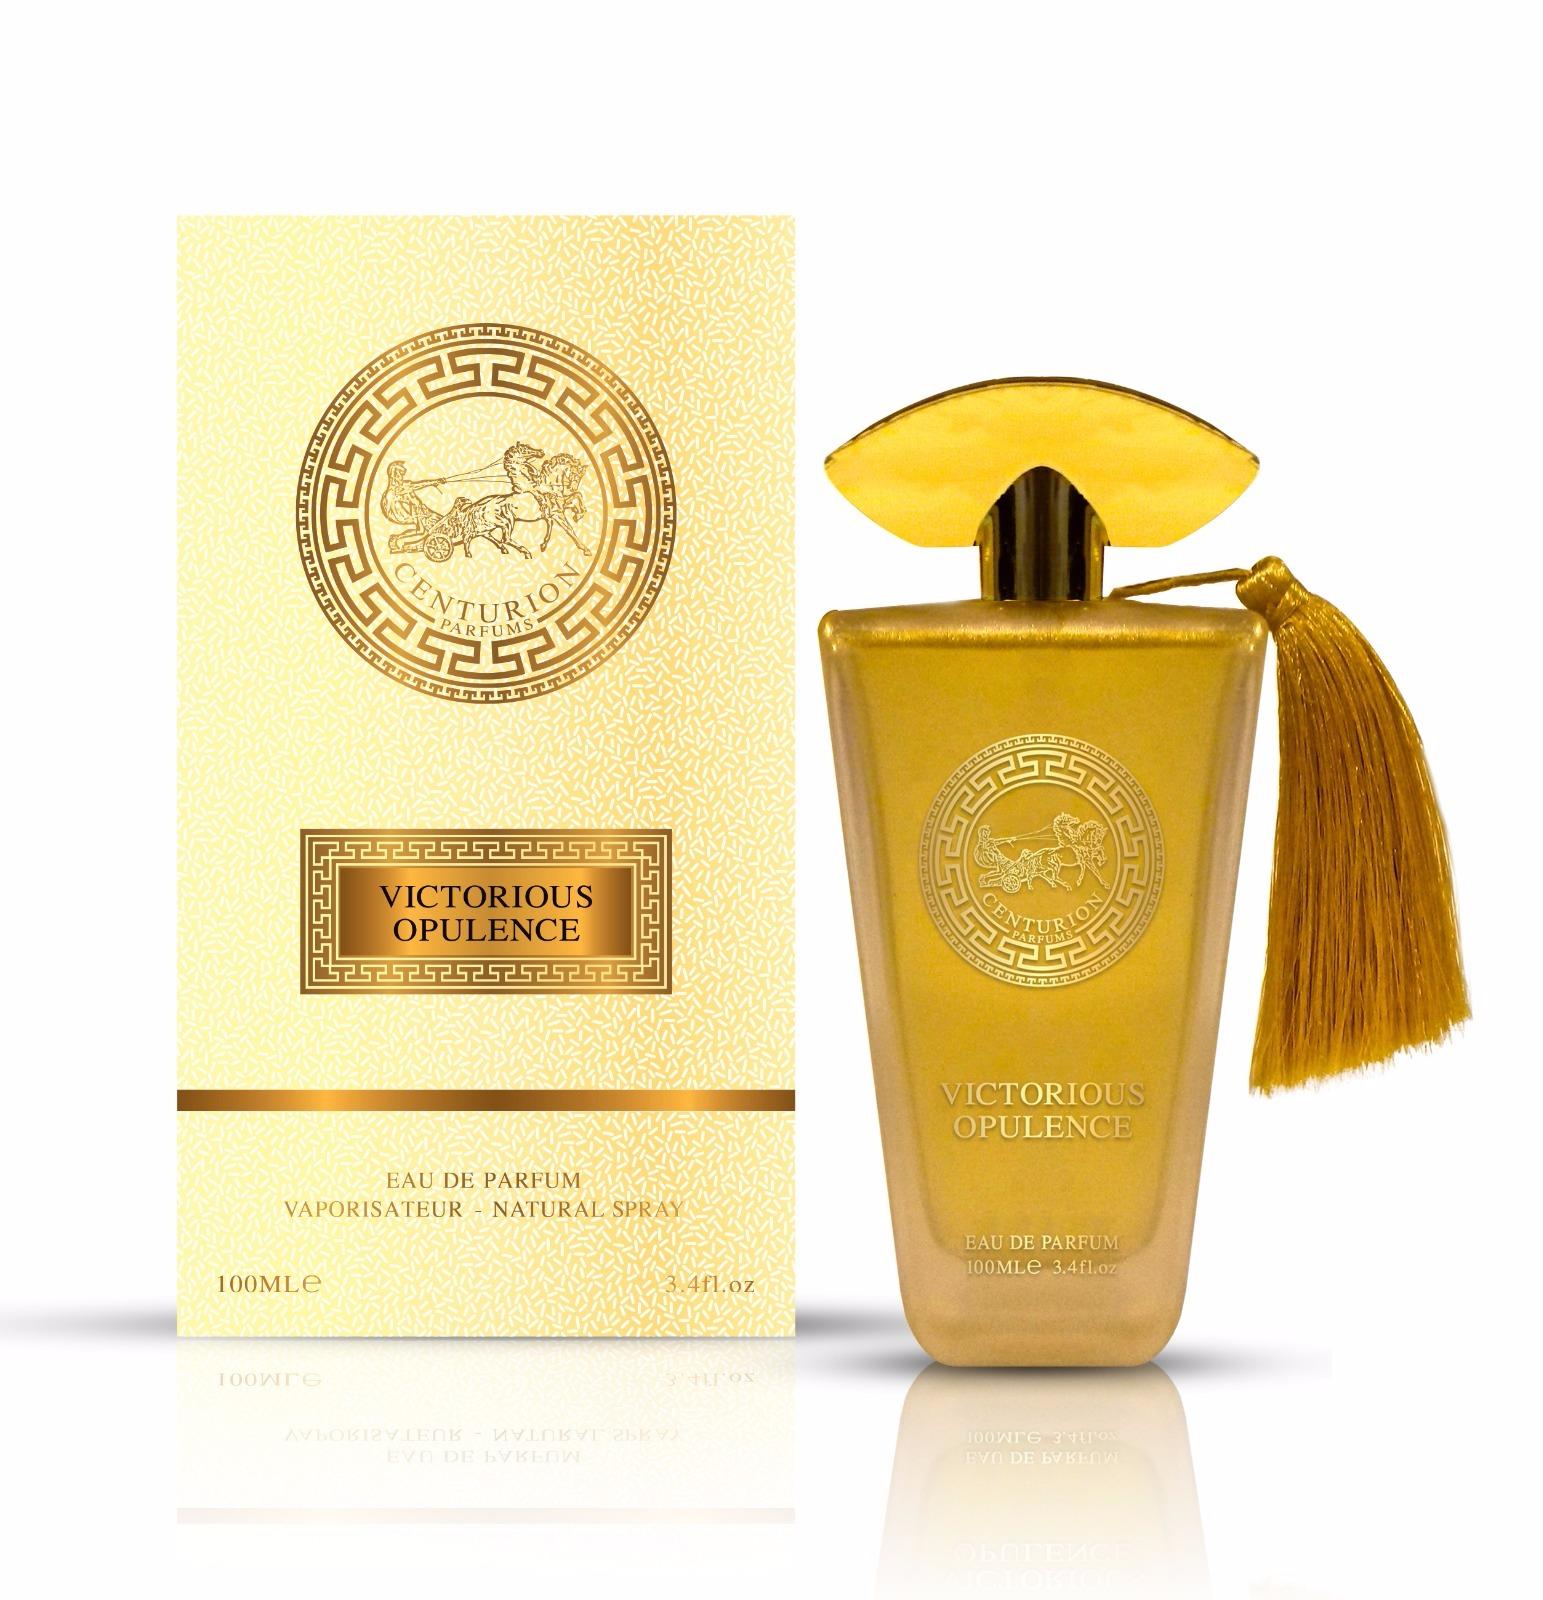 Victorious Opulence Centurion Parfums Perfume